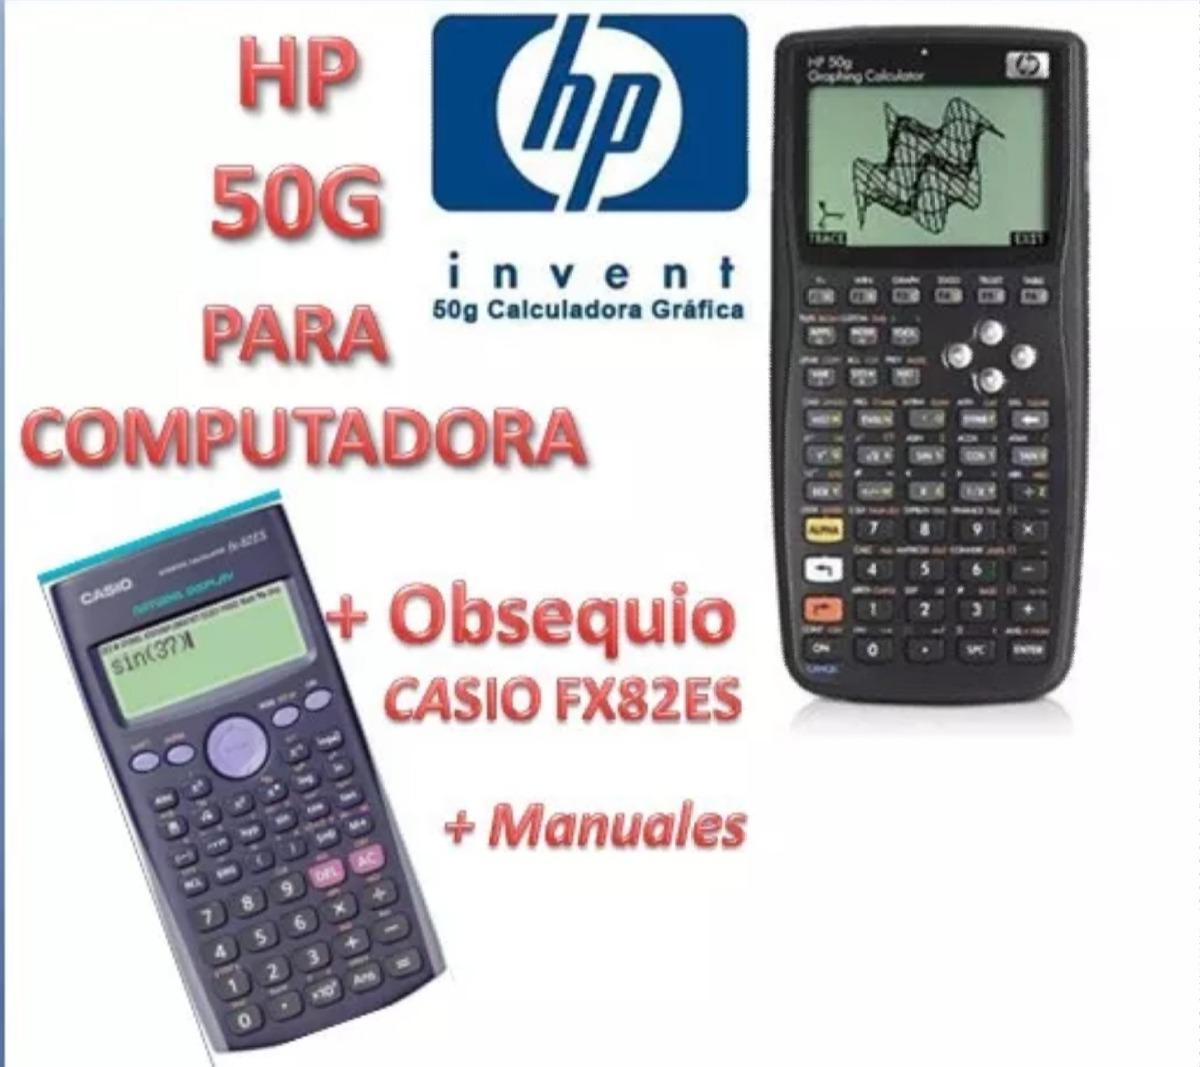 hp50g users guide good owner guide website u2022 rh blogrepairguide today  hp 50g graphing calculator user's manual